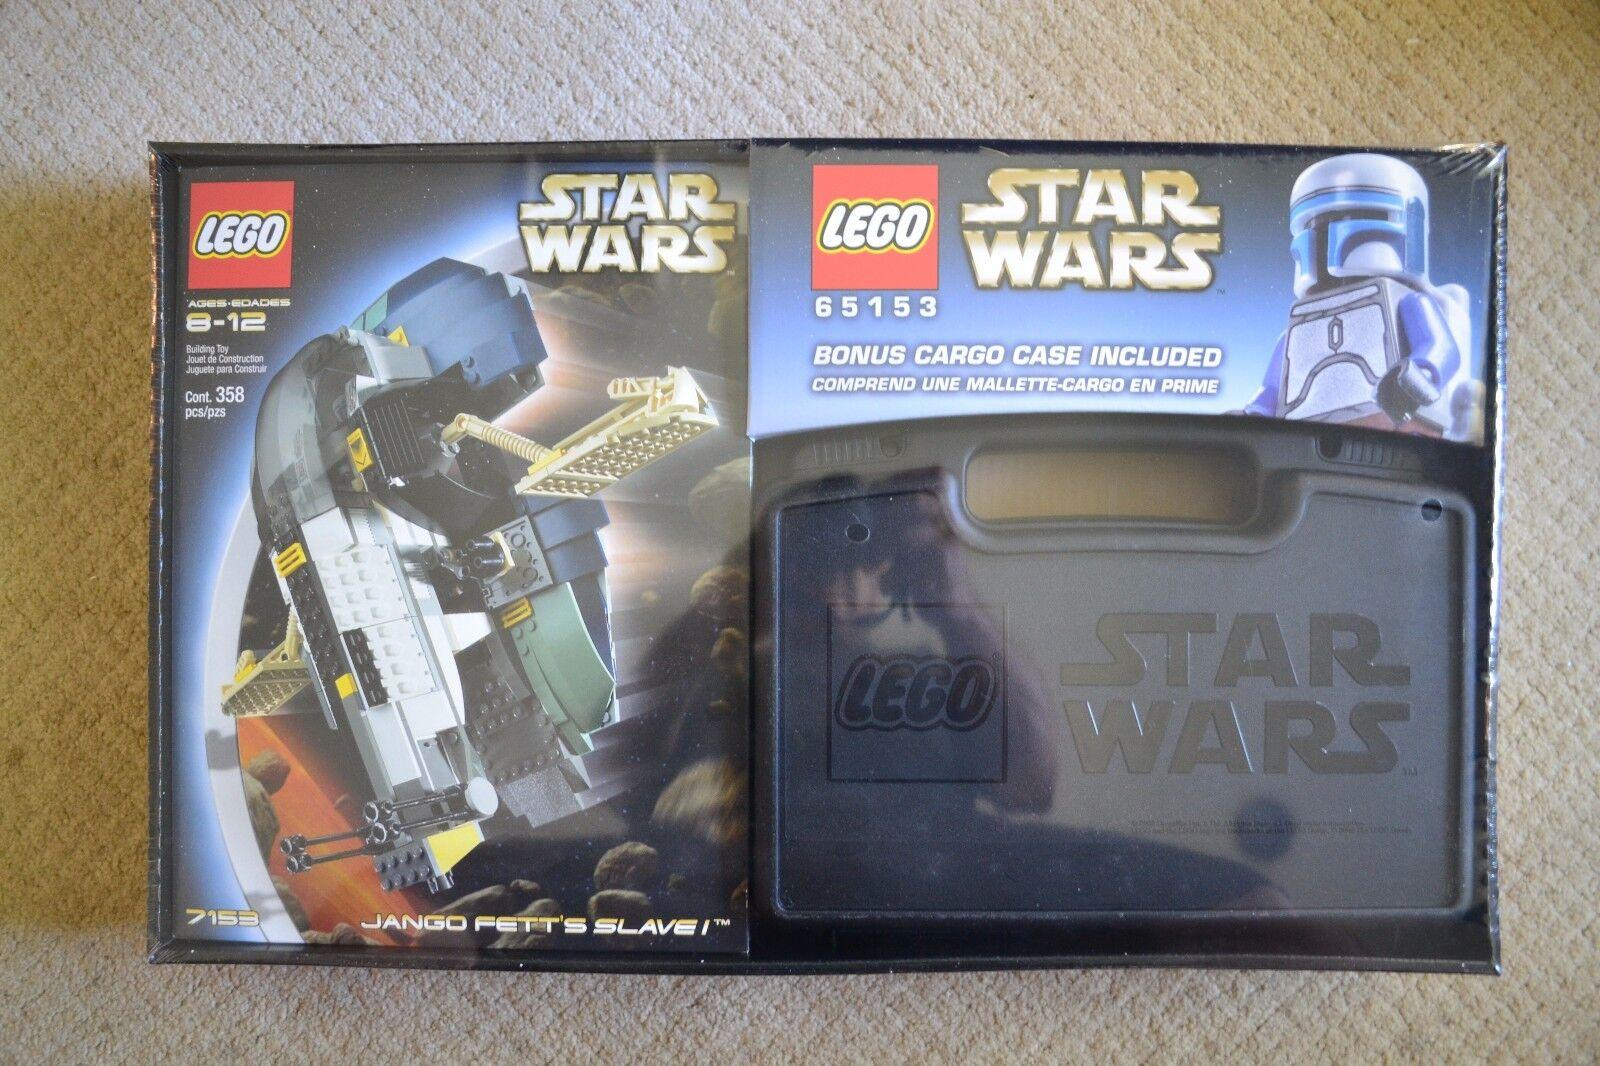 Lego Star Wars 65153 (7153) Jengo Fett's Slave 1 Con Funda De Carga-Sellado-Raro